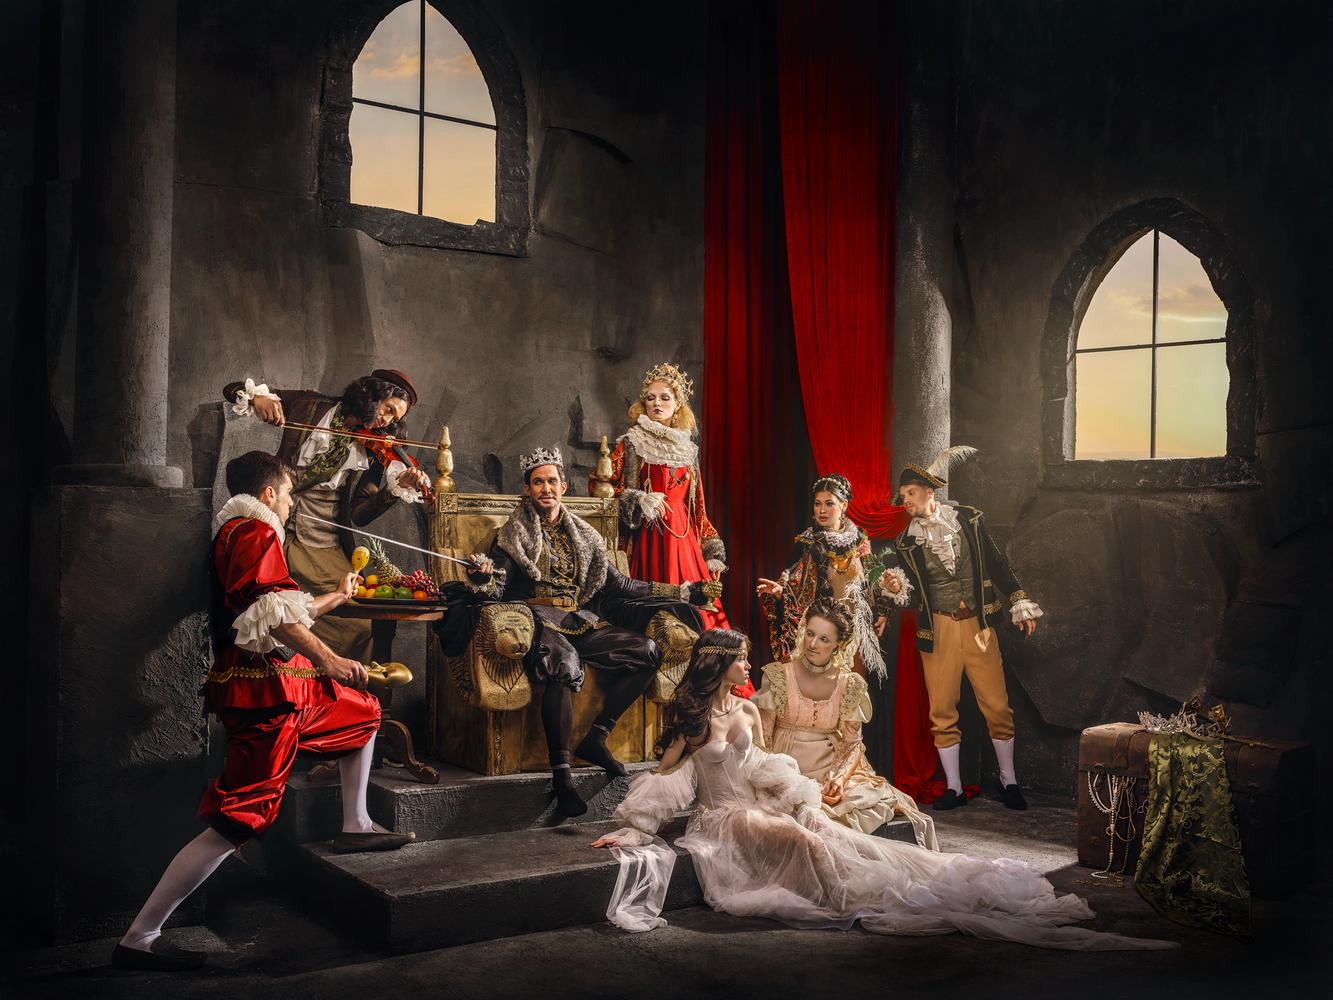 Royal High by Jan Gonzales